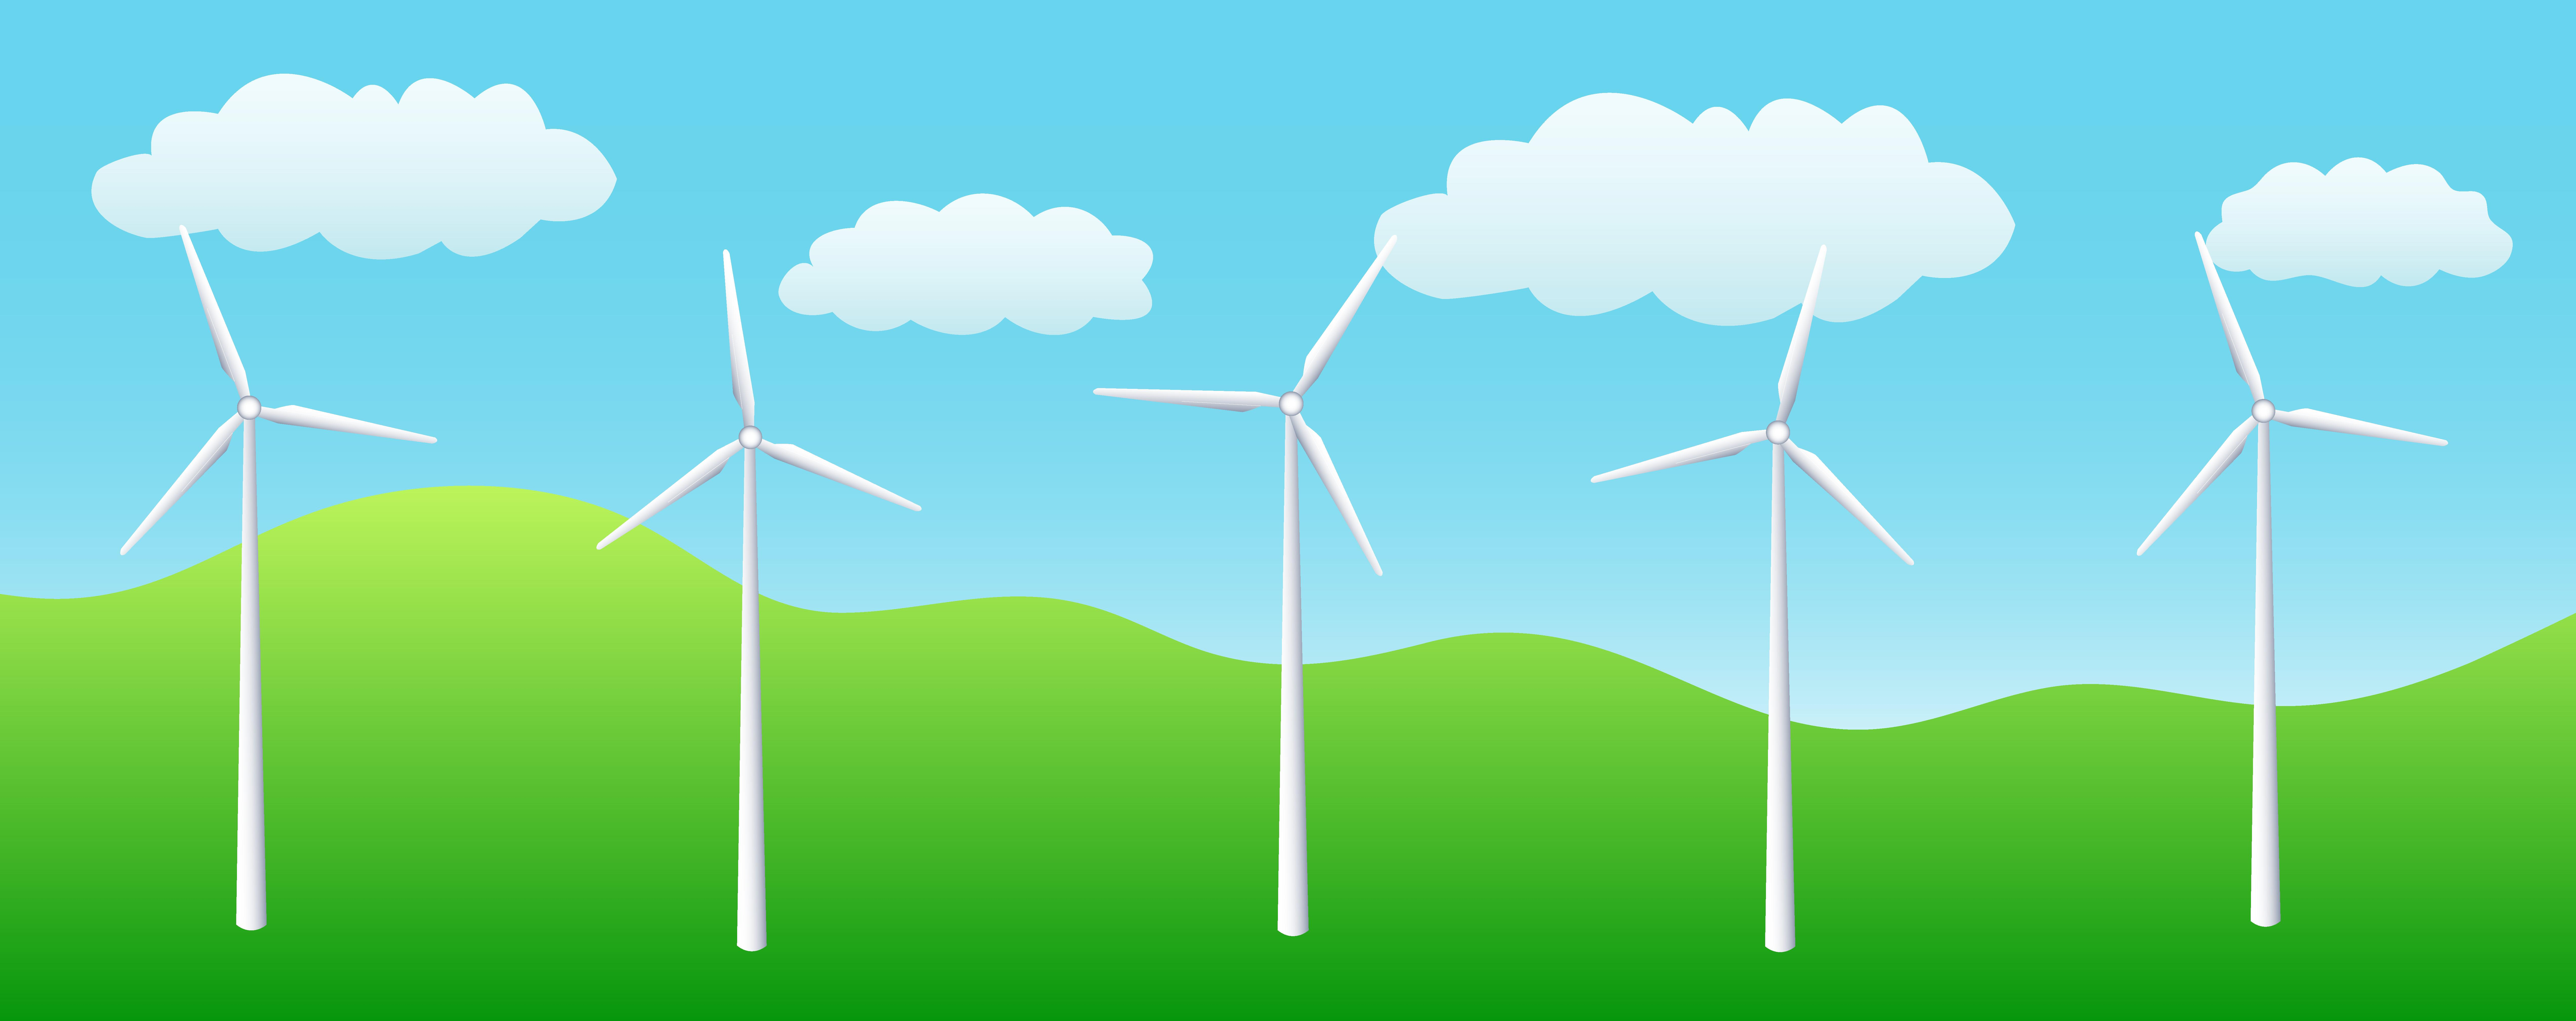 Energy clipart energy windmill Savoronmorehead Clip Wind Art Clip